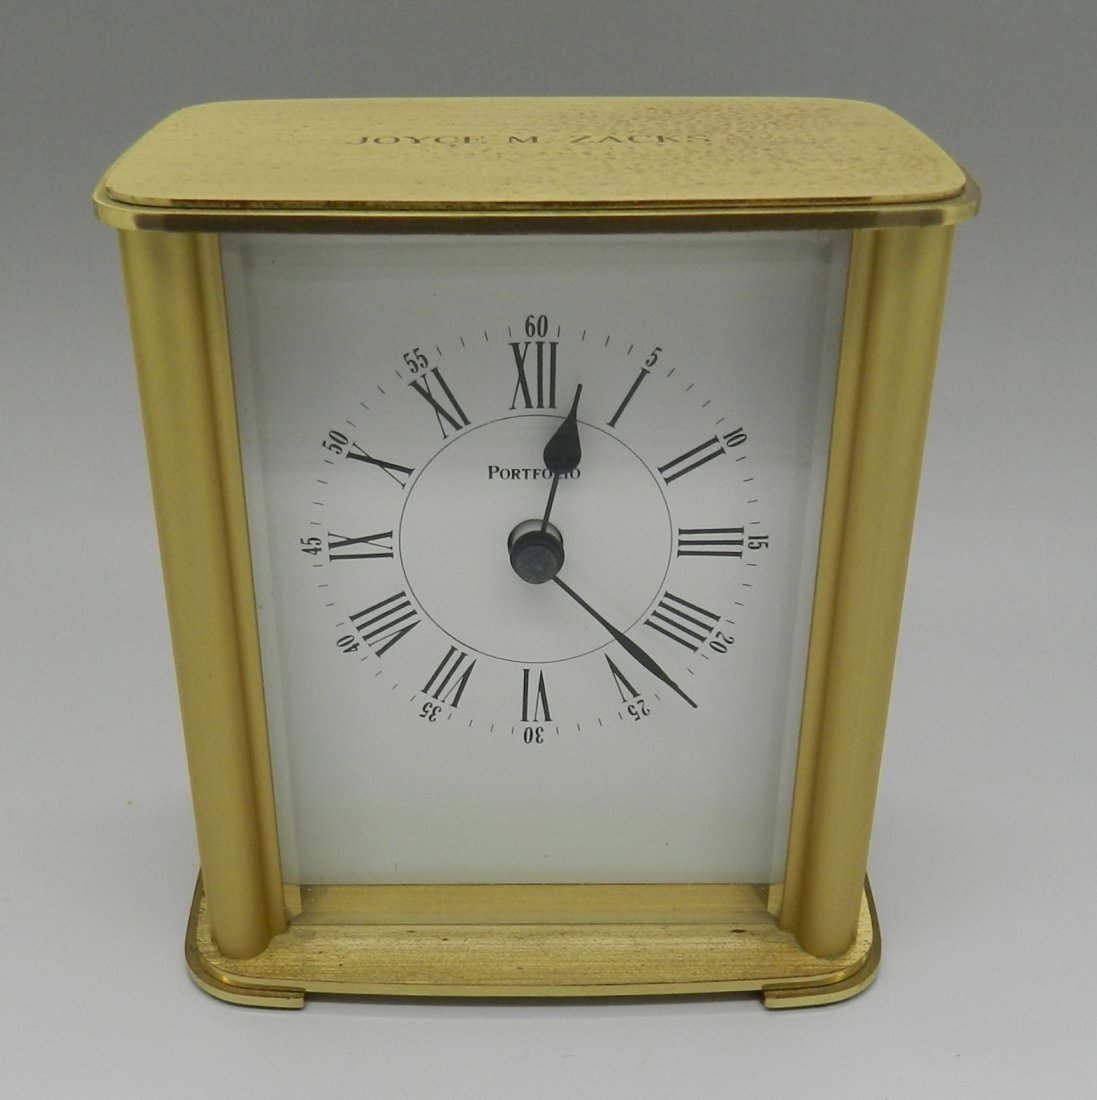 Tiffany & Co Portfolio Mantle Clock